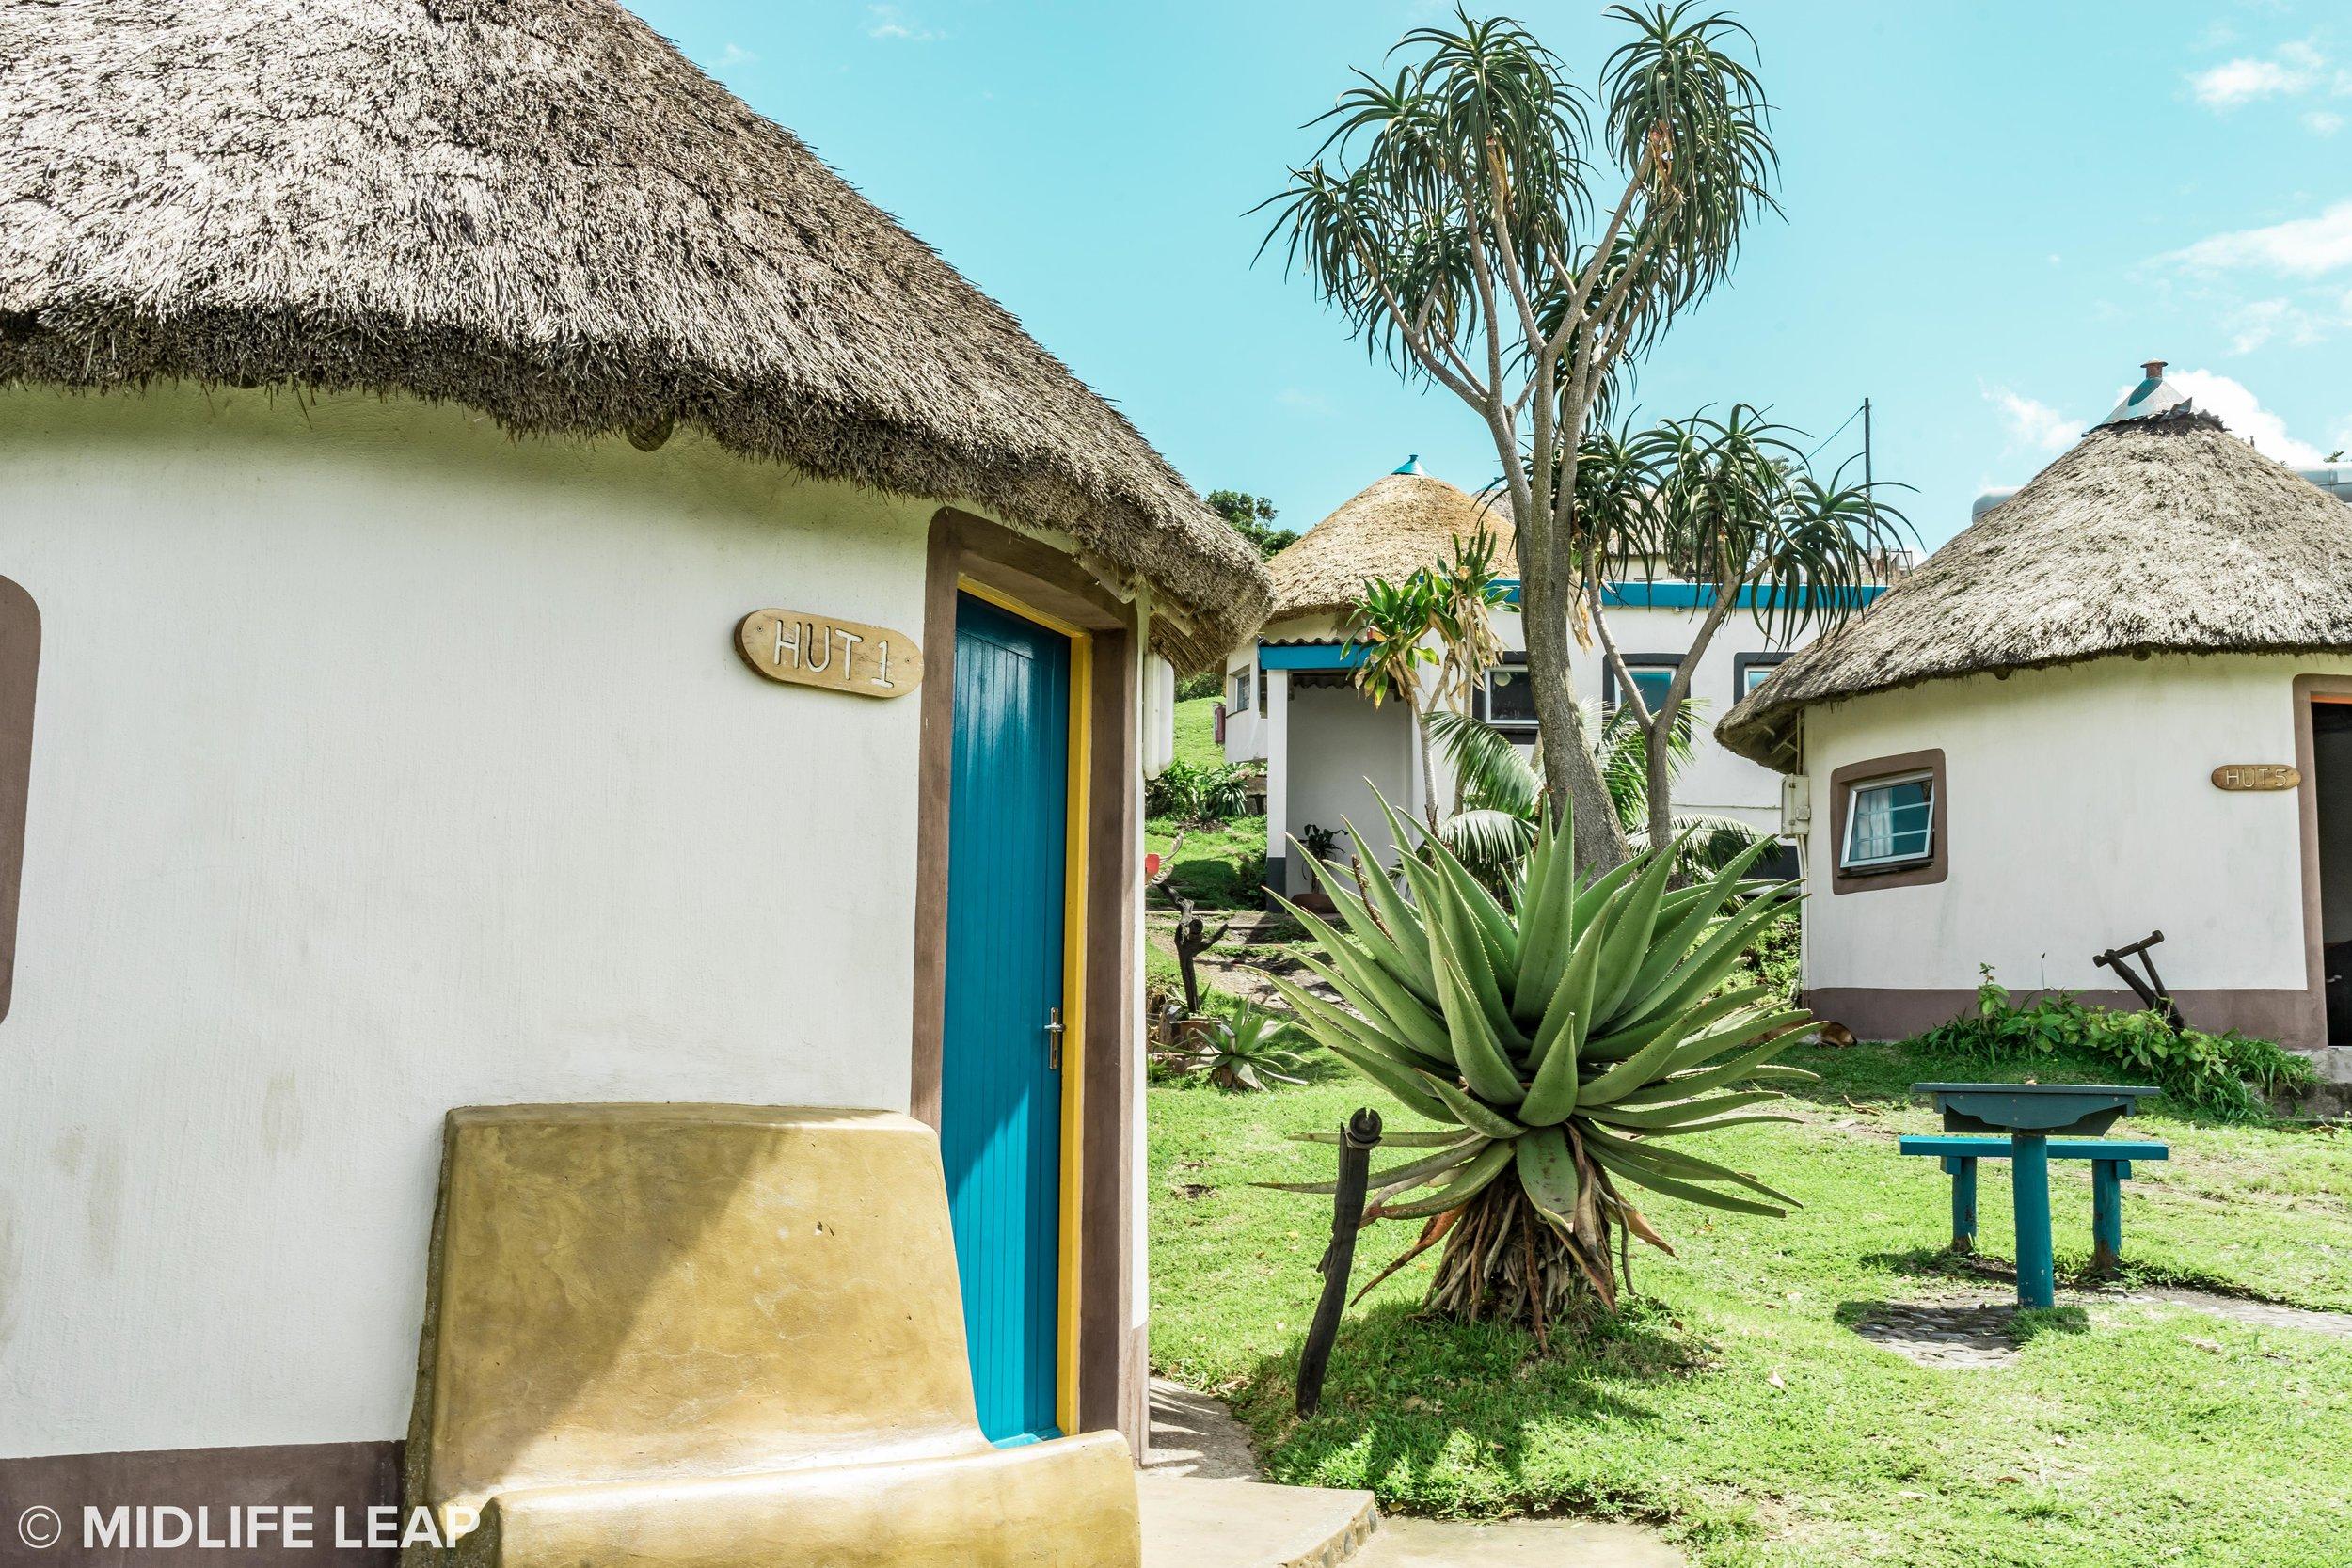 south-africa-wild-coast-coffee-shack.jpg